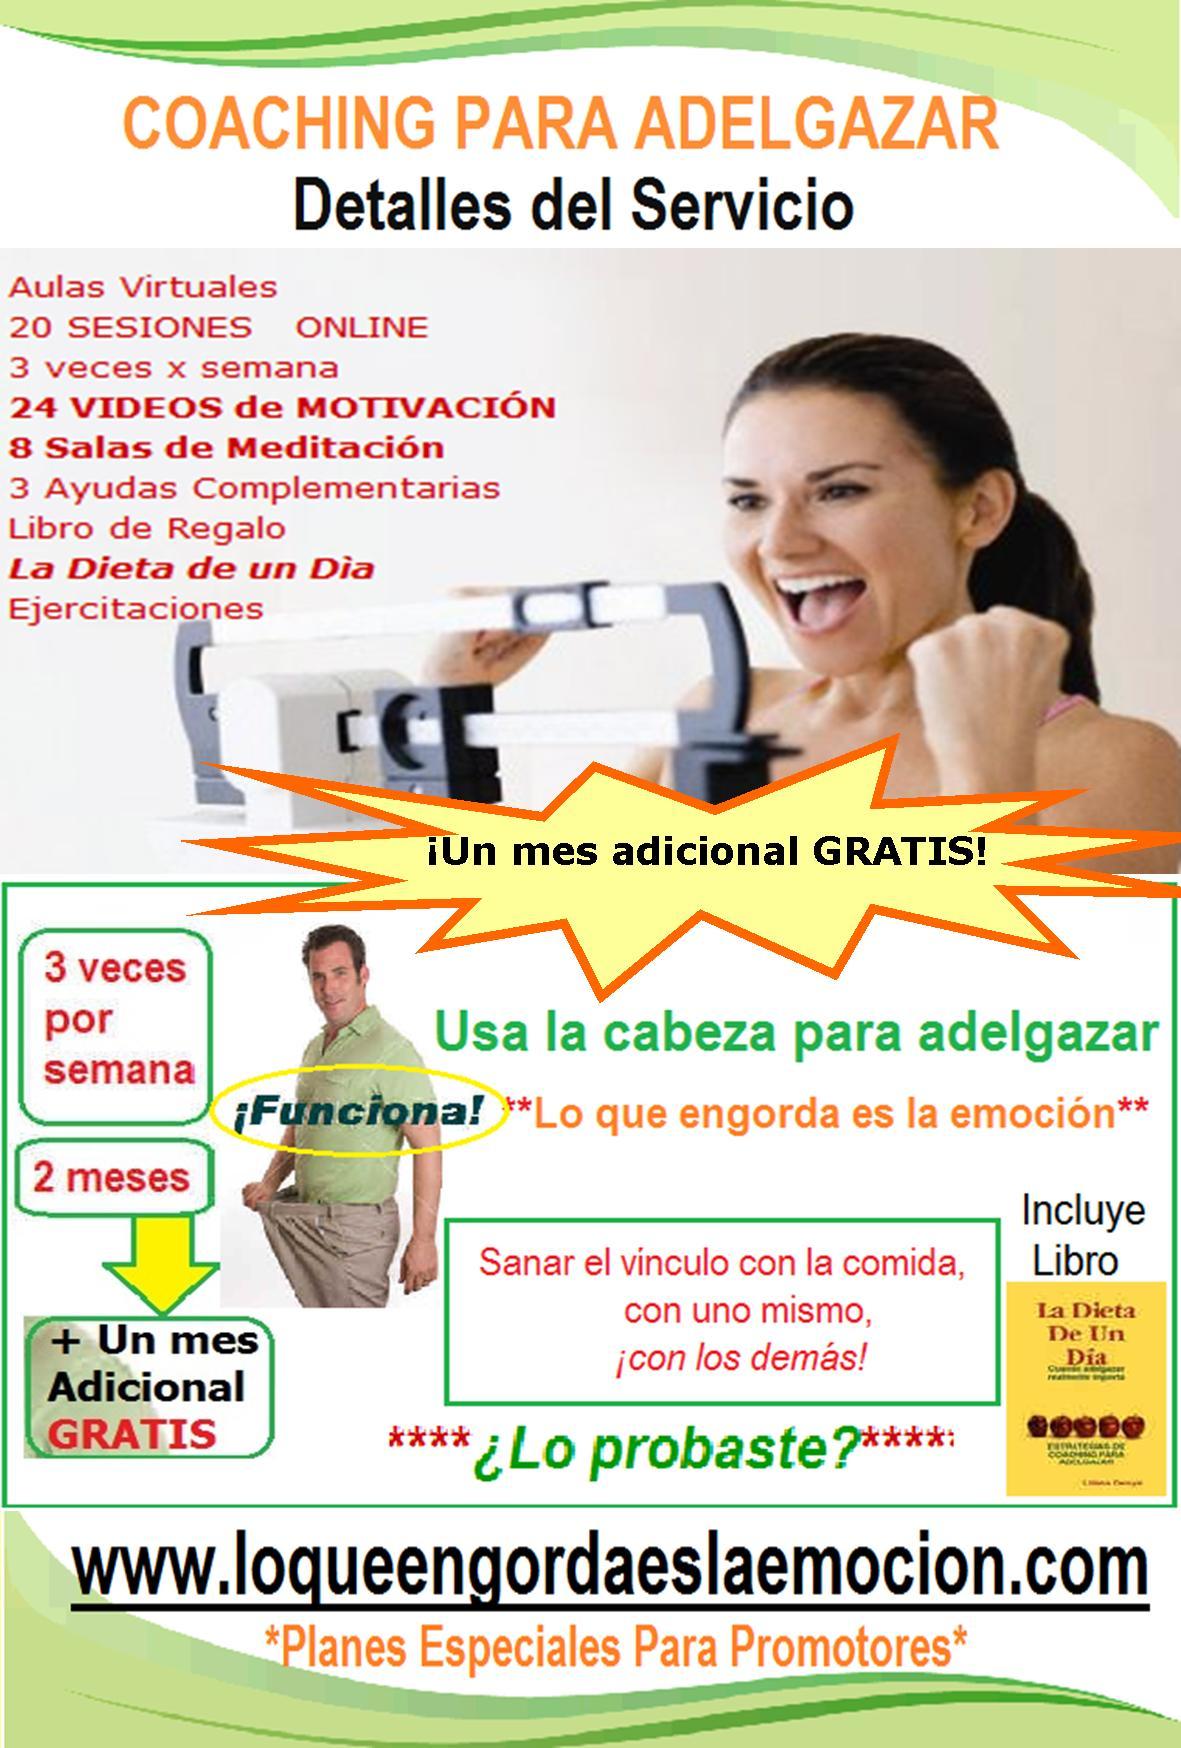 http://www.loqueengordaeslaemocion.com/images/10x15-INT-DORSO3-FULLCOLOR.jpg